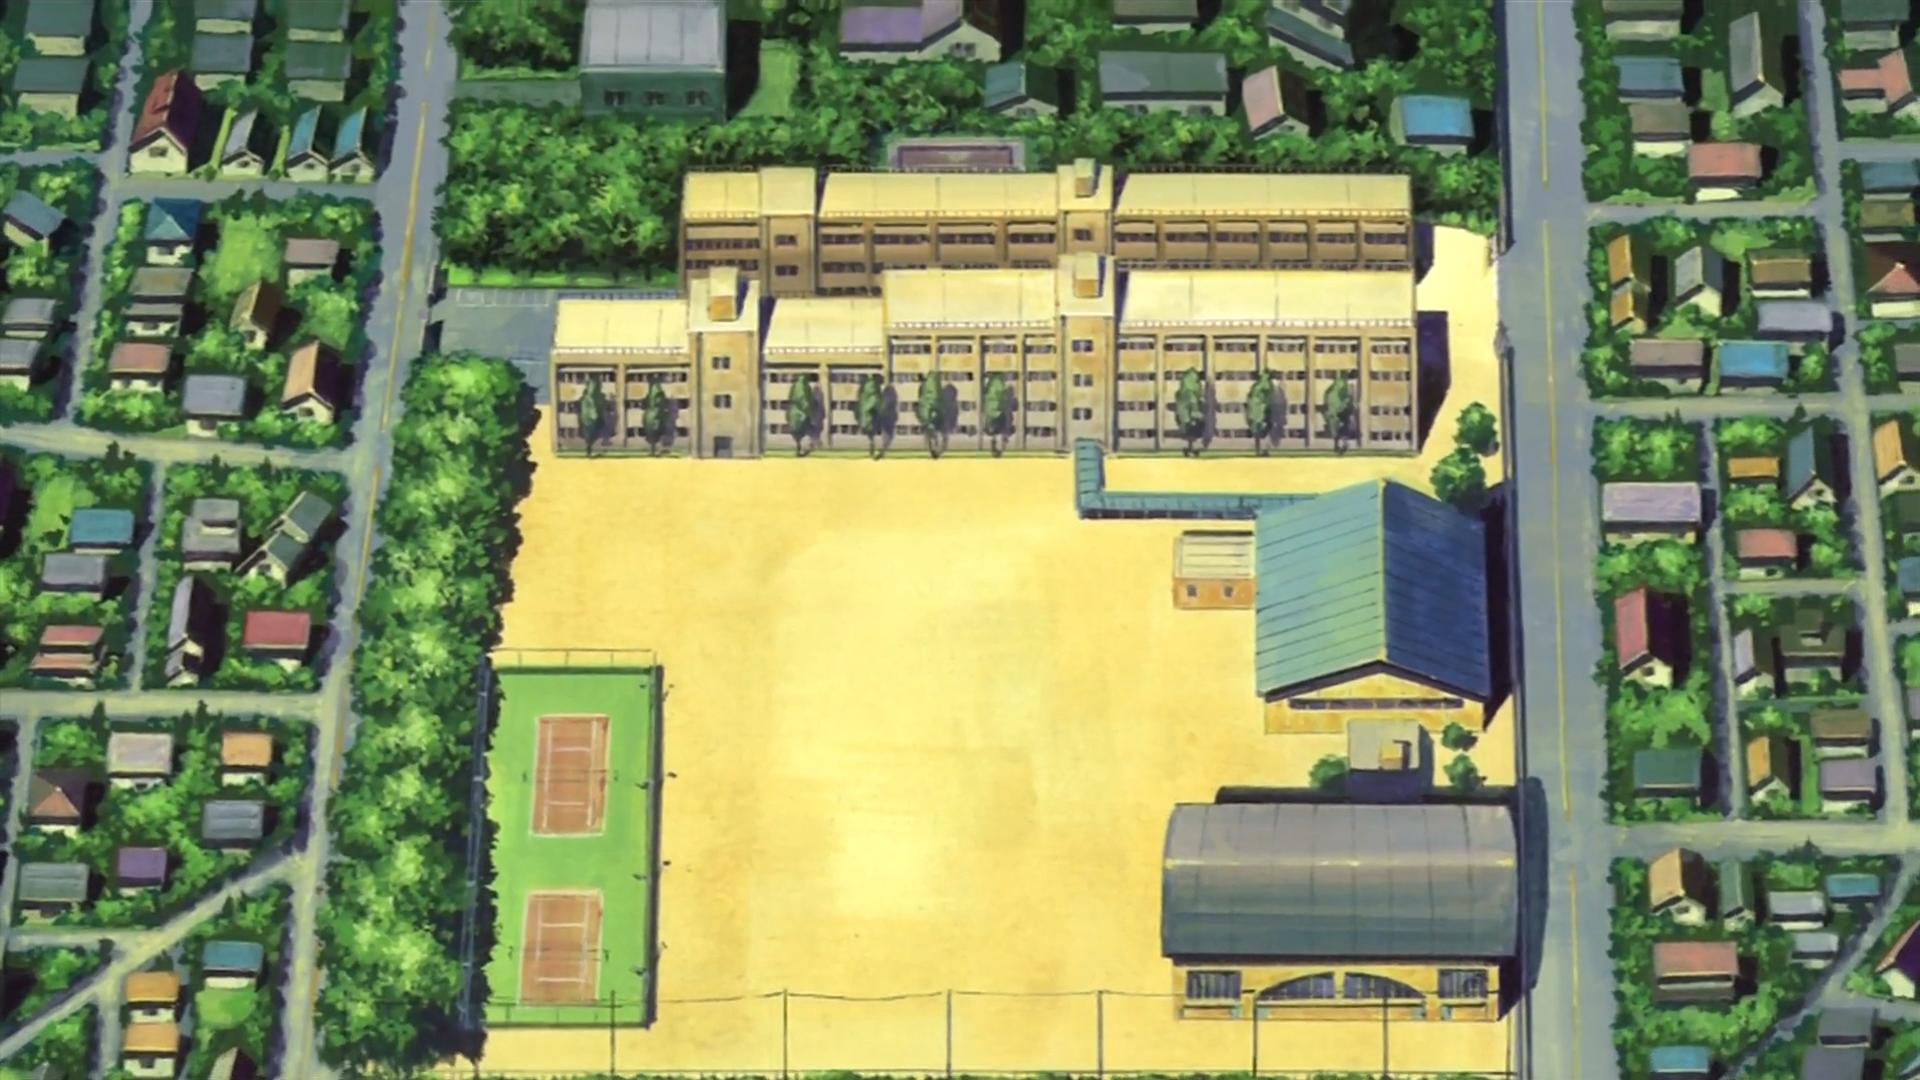 Jindai Municipal High School